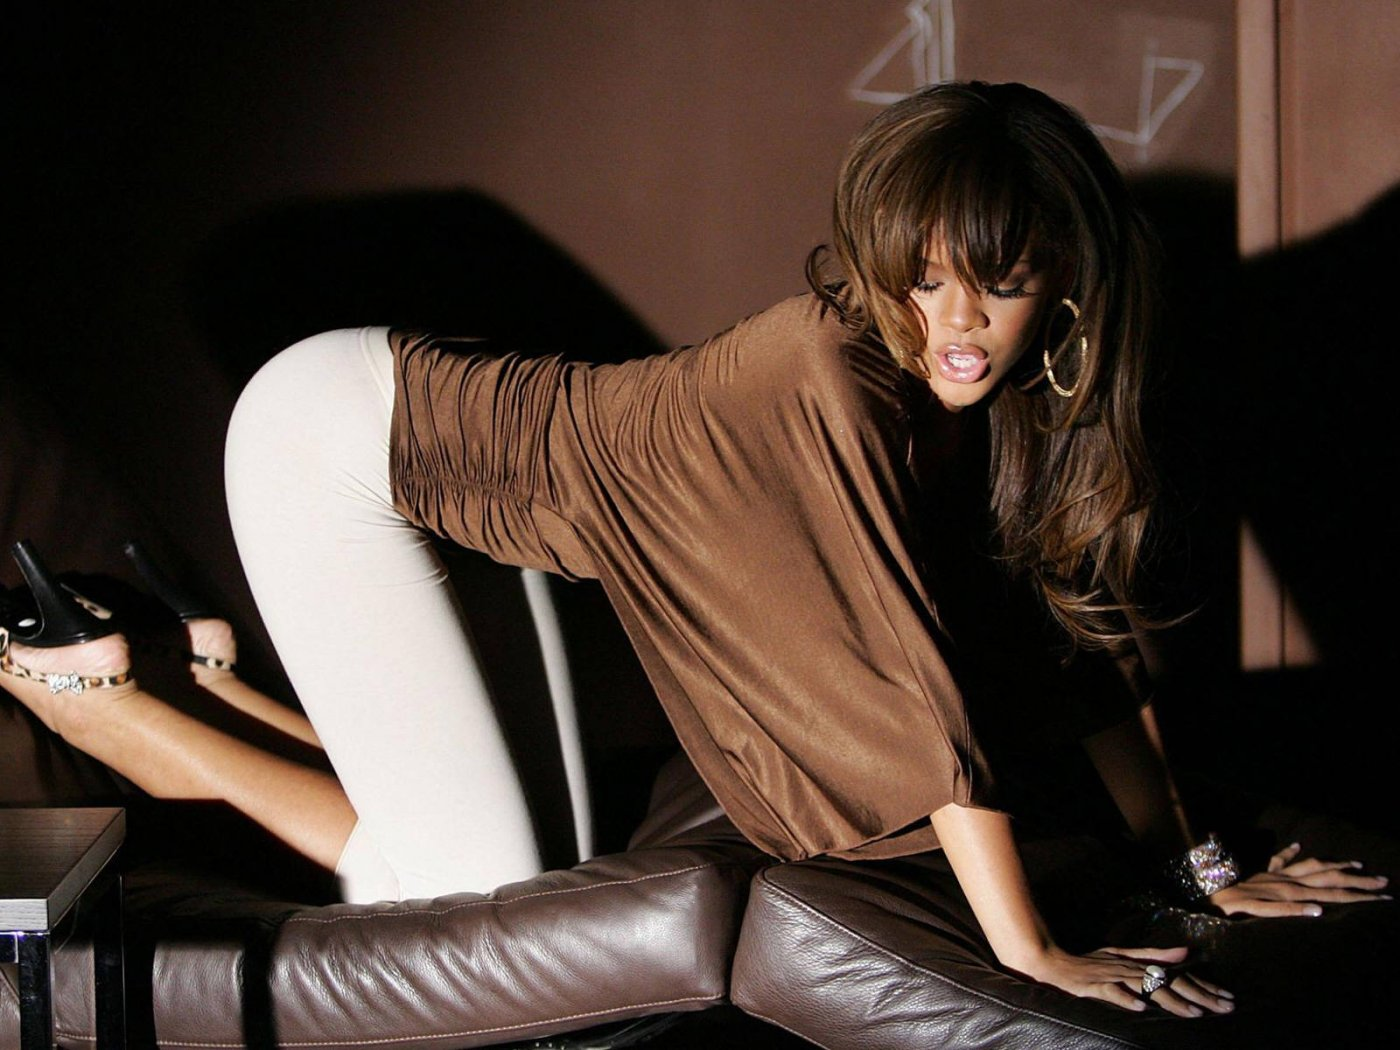 http://3.bp.blogspot.com/-lxMe-7Tmp0k/T7VN68U0noI/AAAAAAAAAyw/f4gQIymDgwA/s1600/Rihanna+Hot+Images+Wallapers+02.jpg